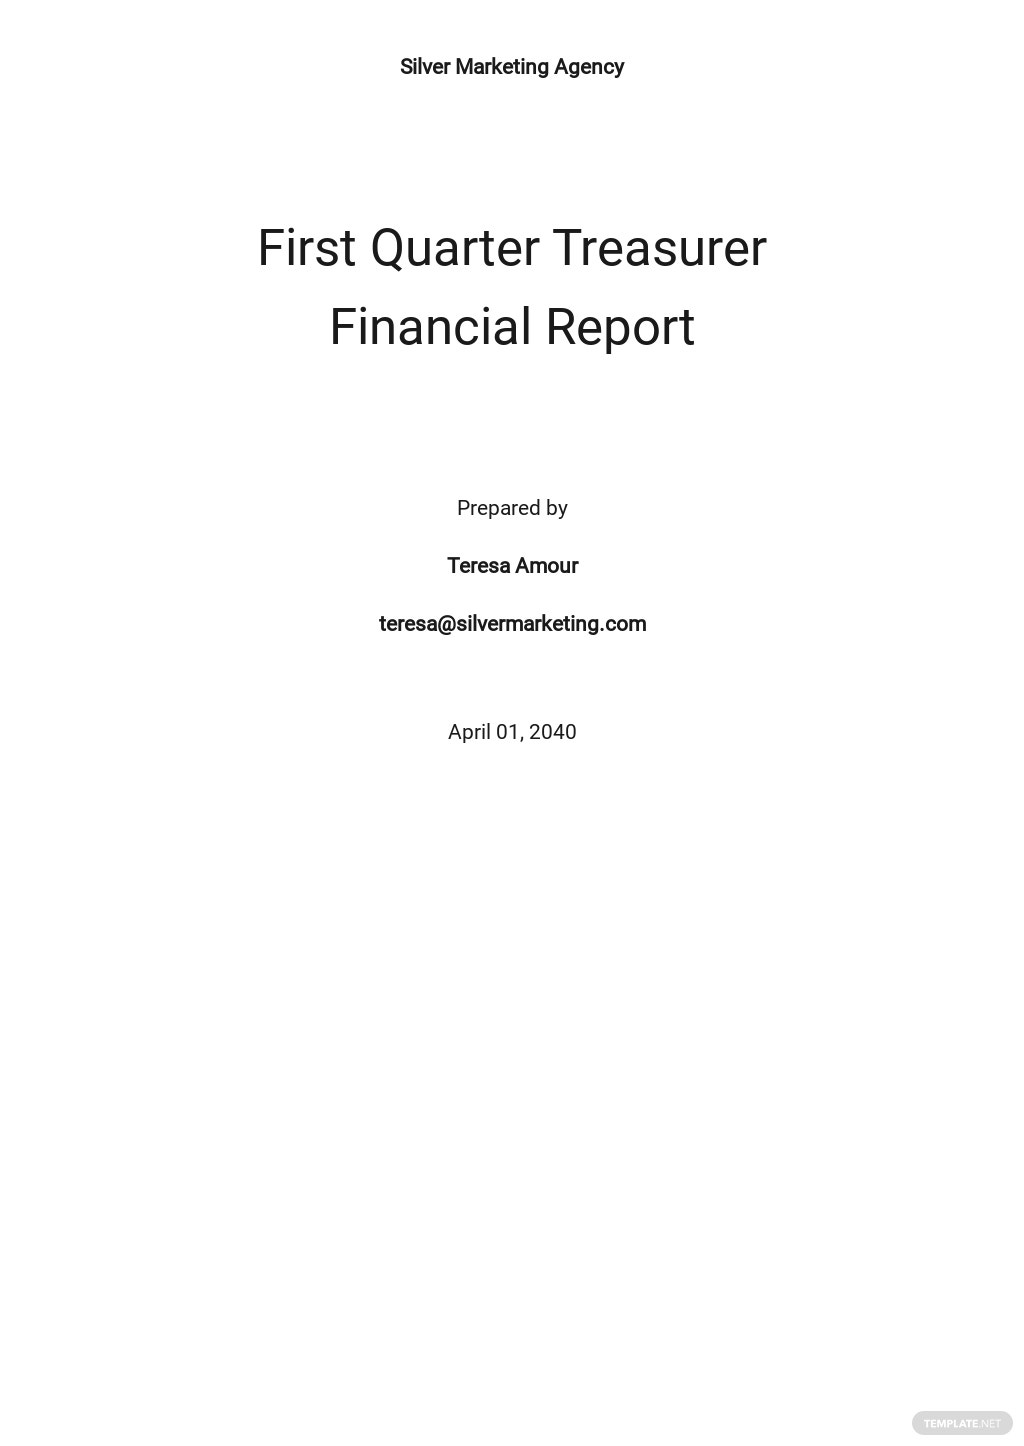 Treasurer Financial Report Template.jpe